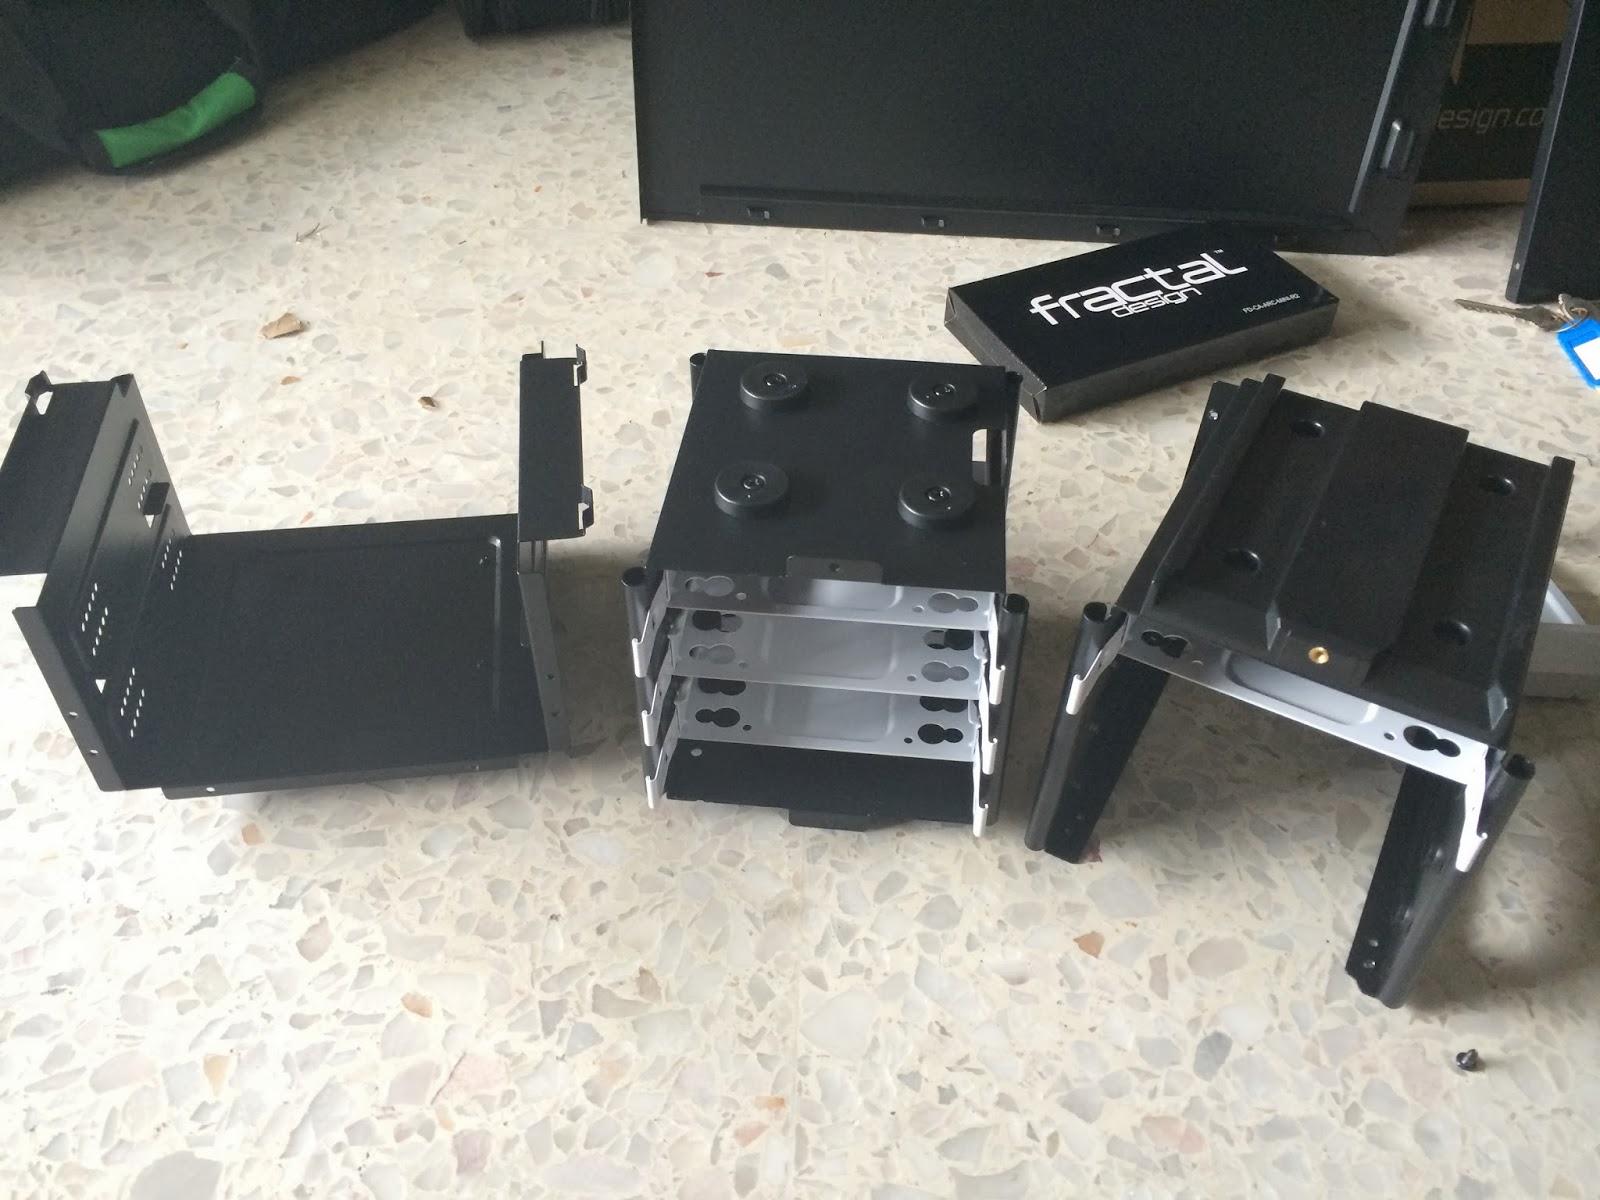 Fractal Design Arc Mini R2 140